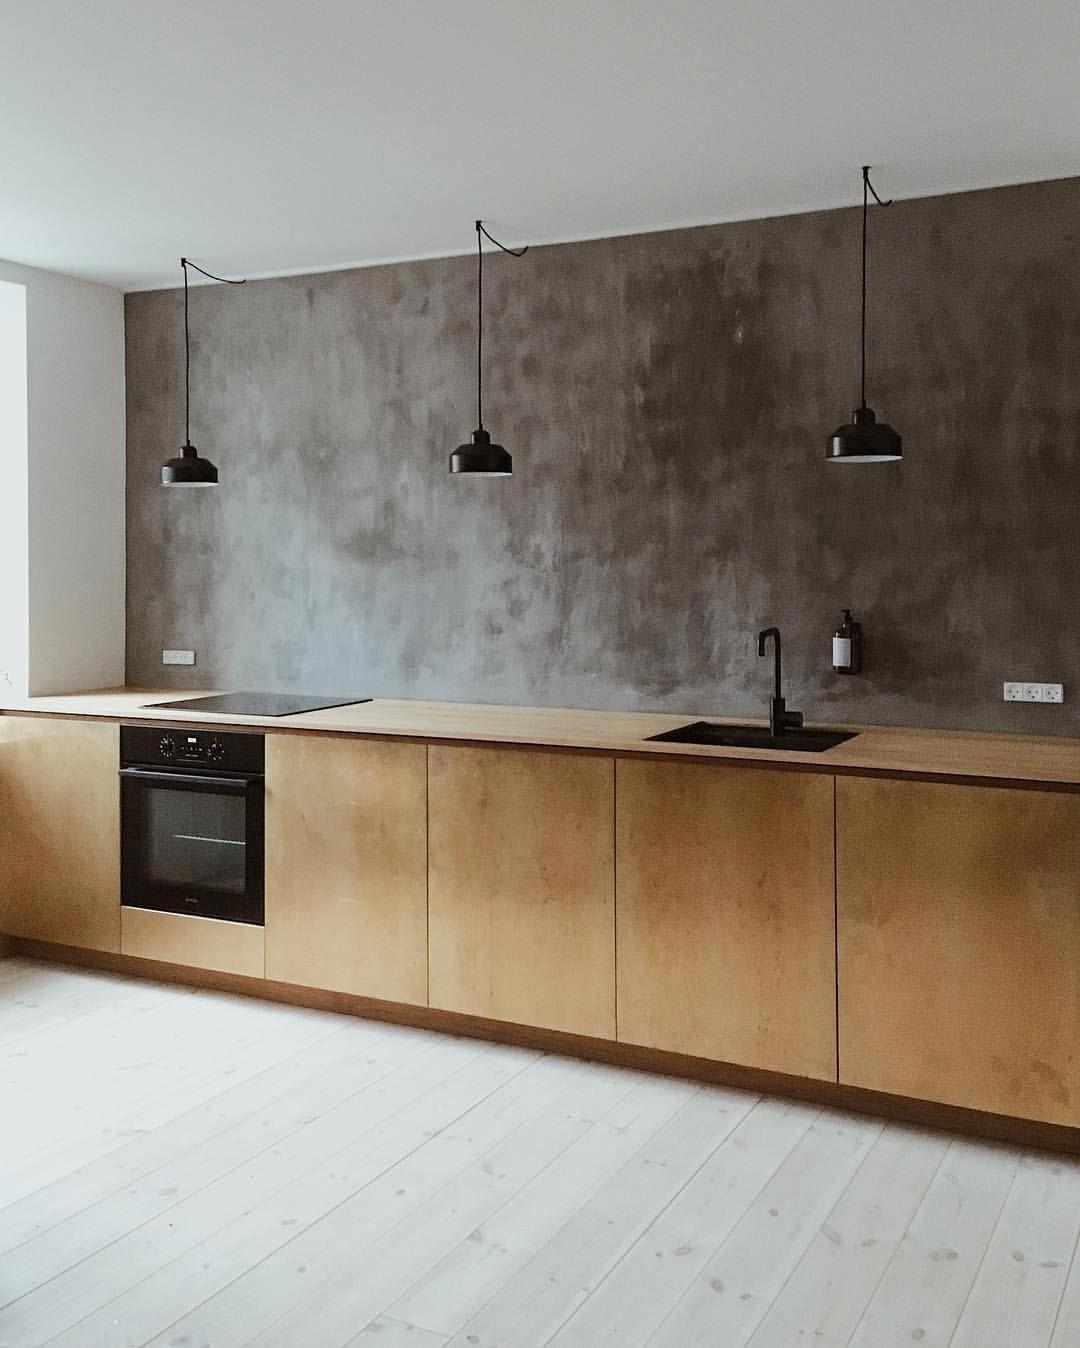 The 21 Best Ideas For Modern Kitchen Design Best Home Ideas And Inspiration Modern Kitchen Interiors Kitchen Design Decor Industrial Decor Kitchen